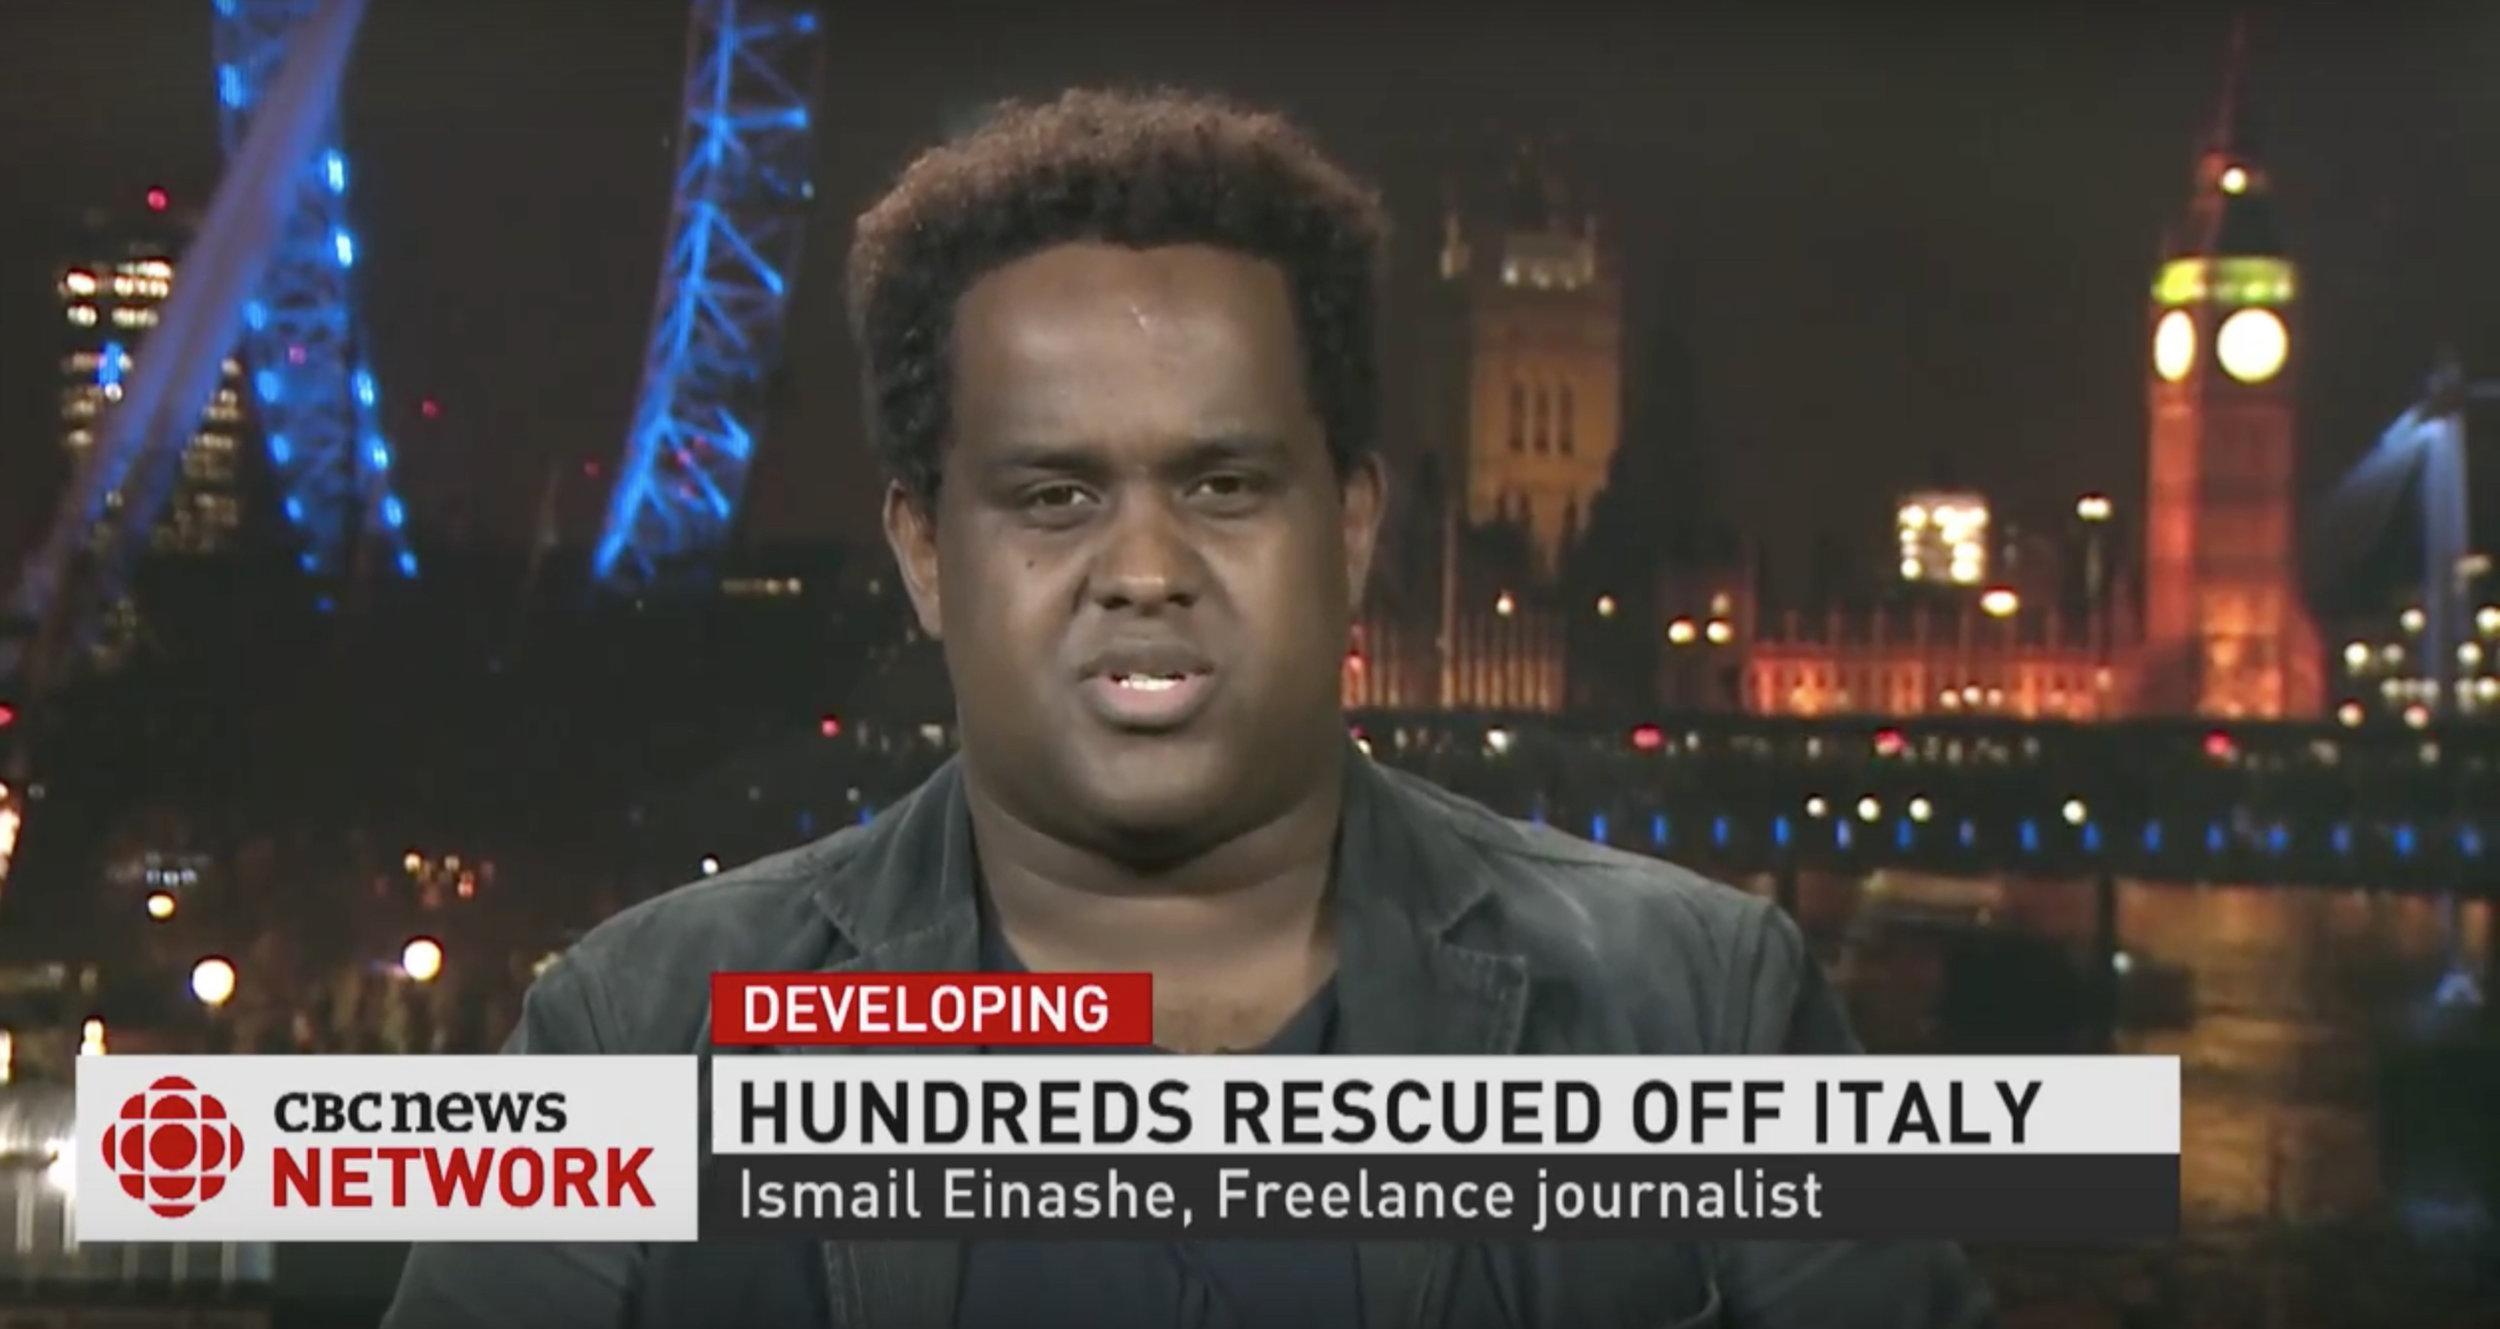 CBC News interview